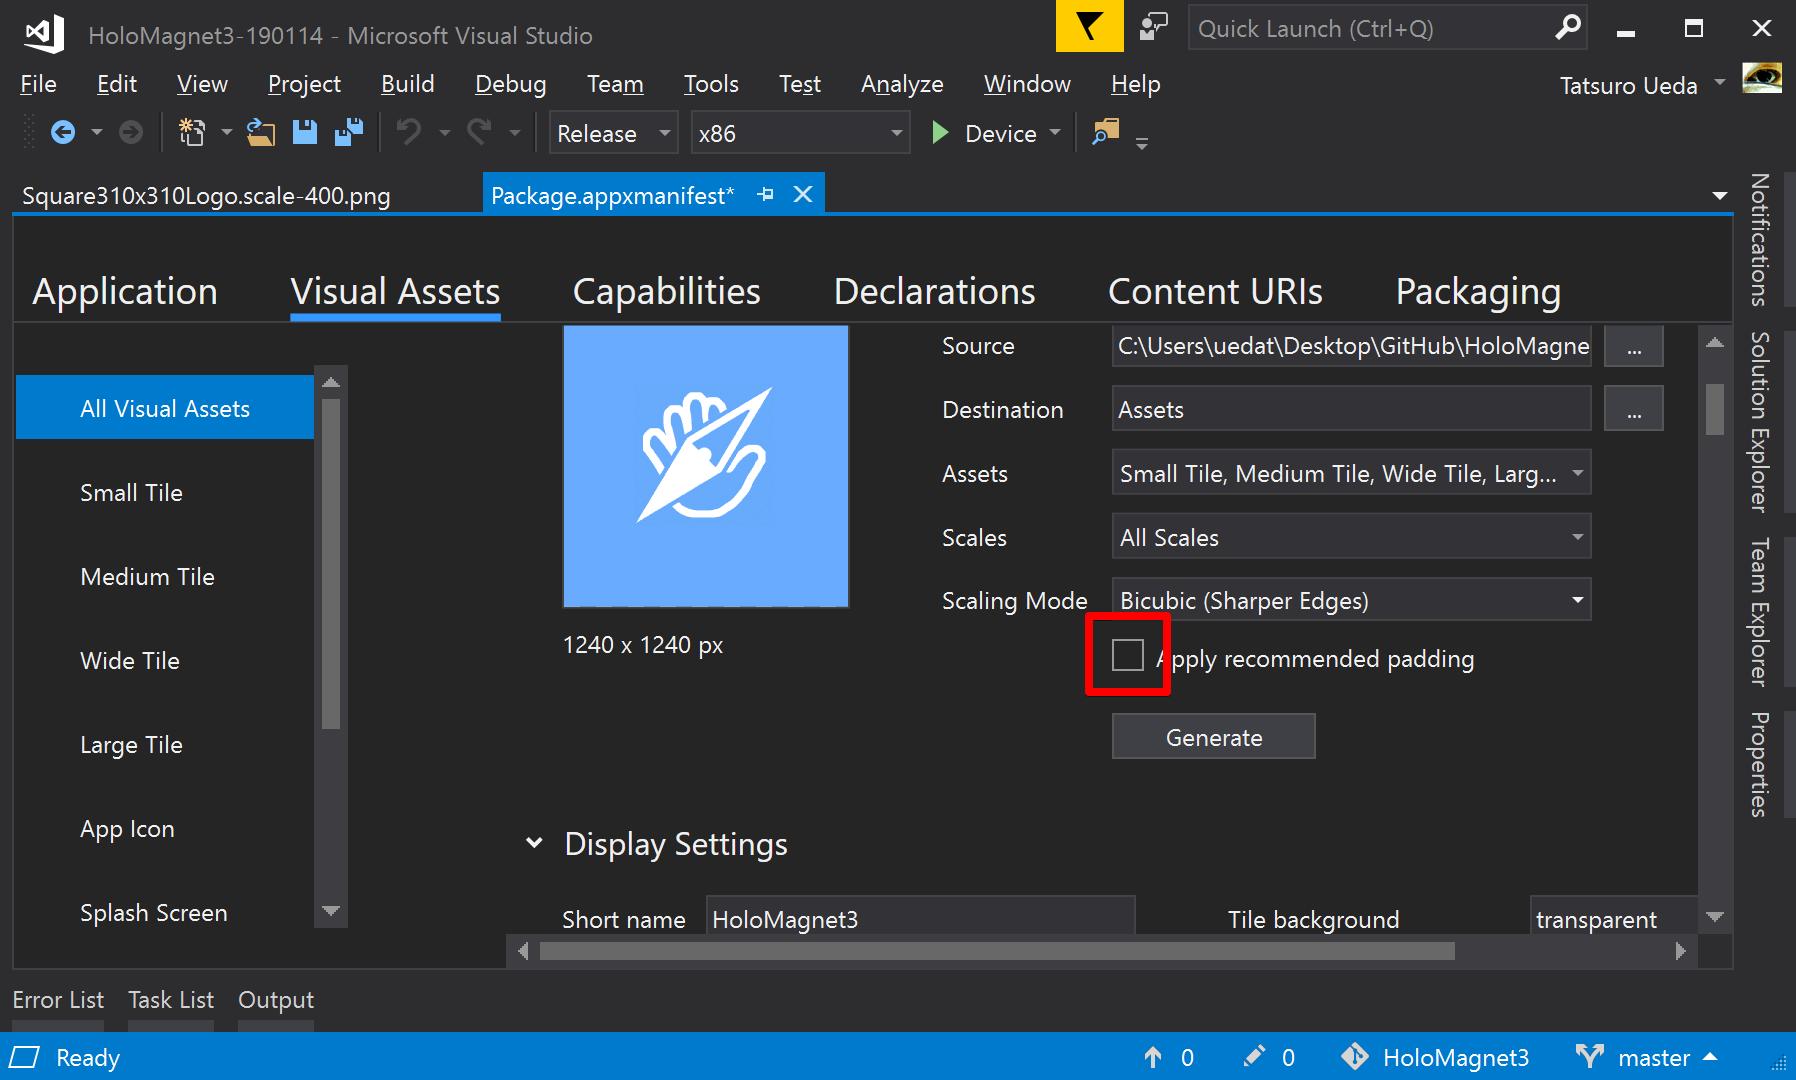 HoloMagnet3-190114 - Microsoft Visual Studio 2019-05-20 10 53 49